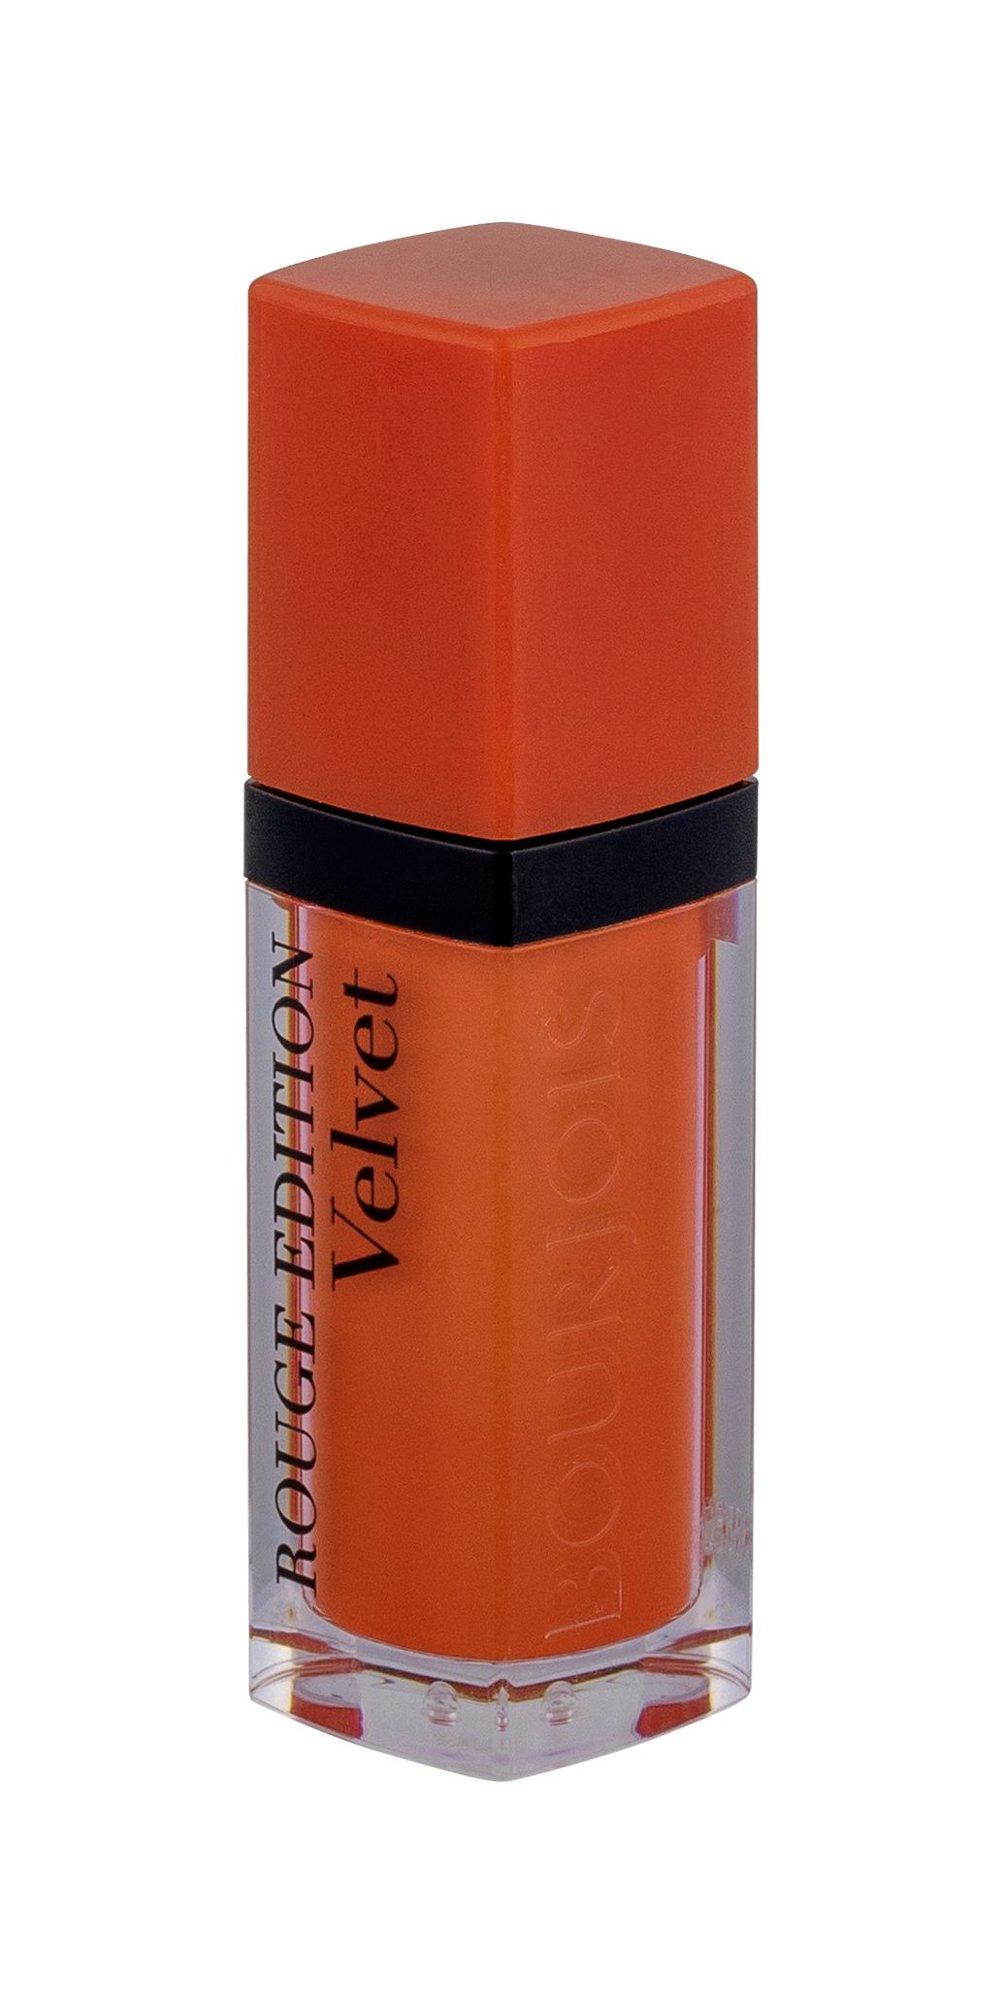 BOURJOIS Paris Rouge Edition Lipstick 7,7ml 30 Oranginal